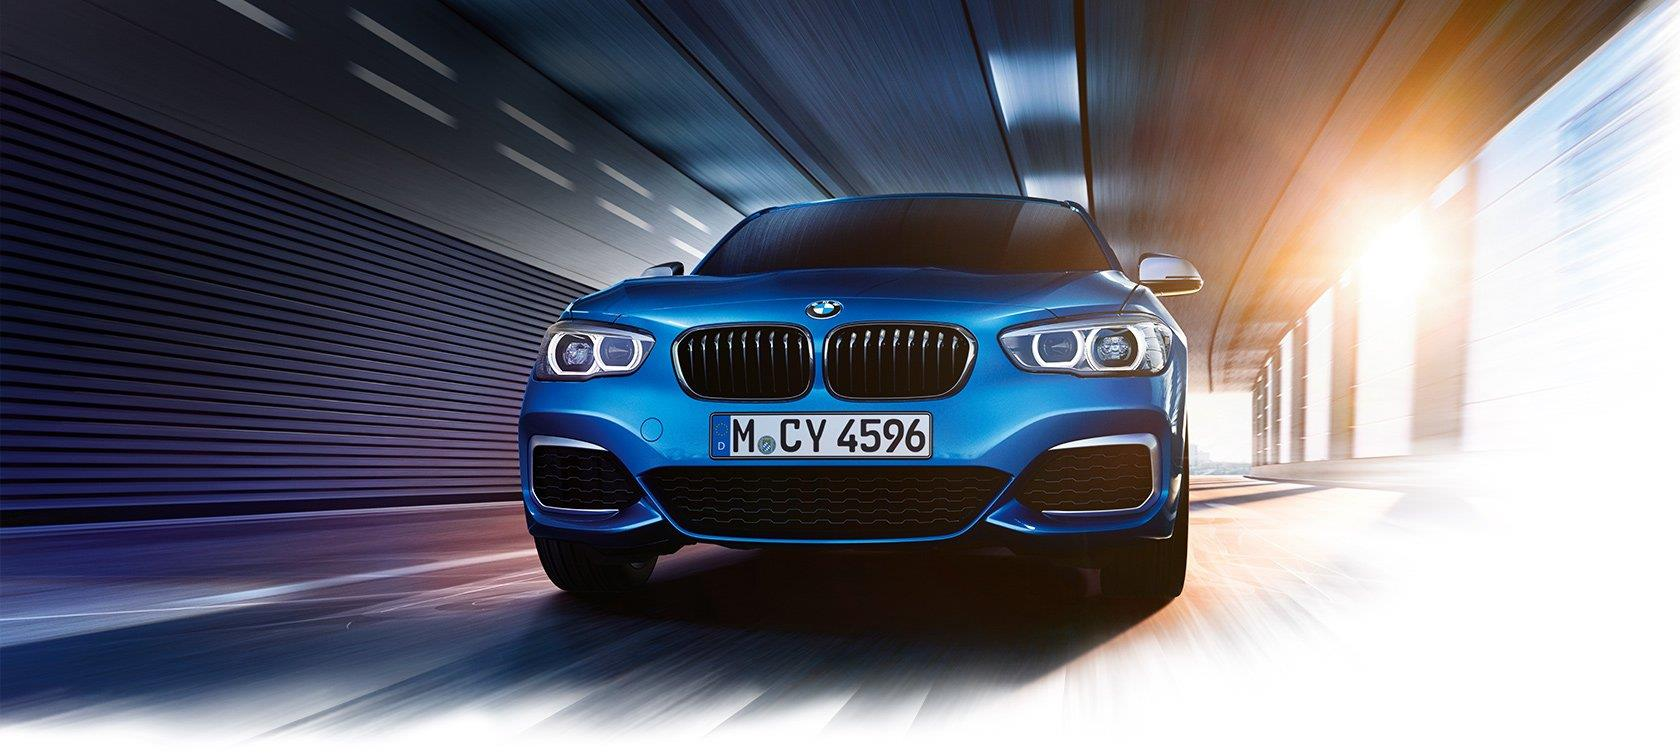 BMW 1 Serisi 5-Kapı